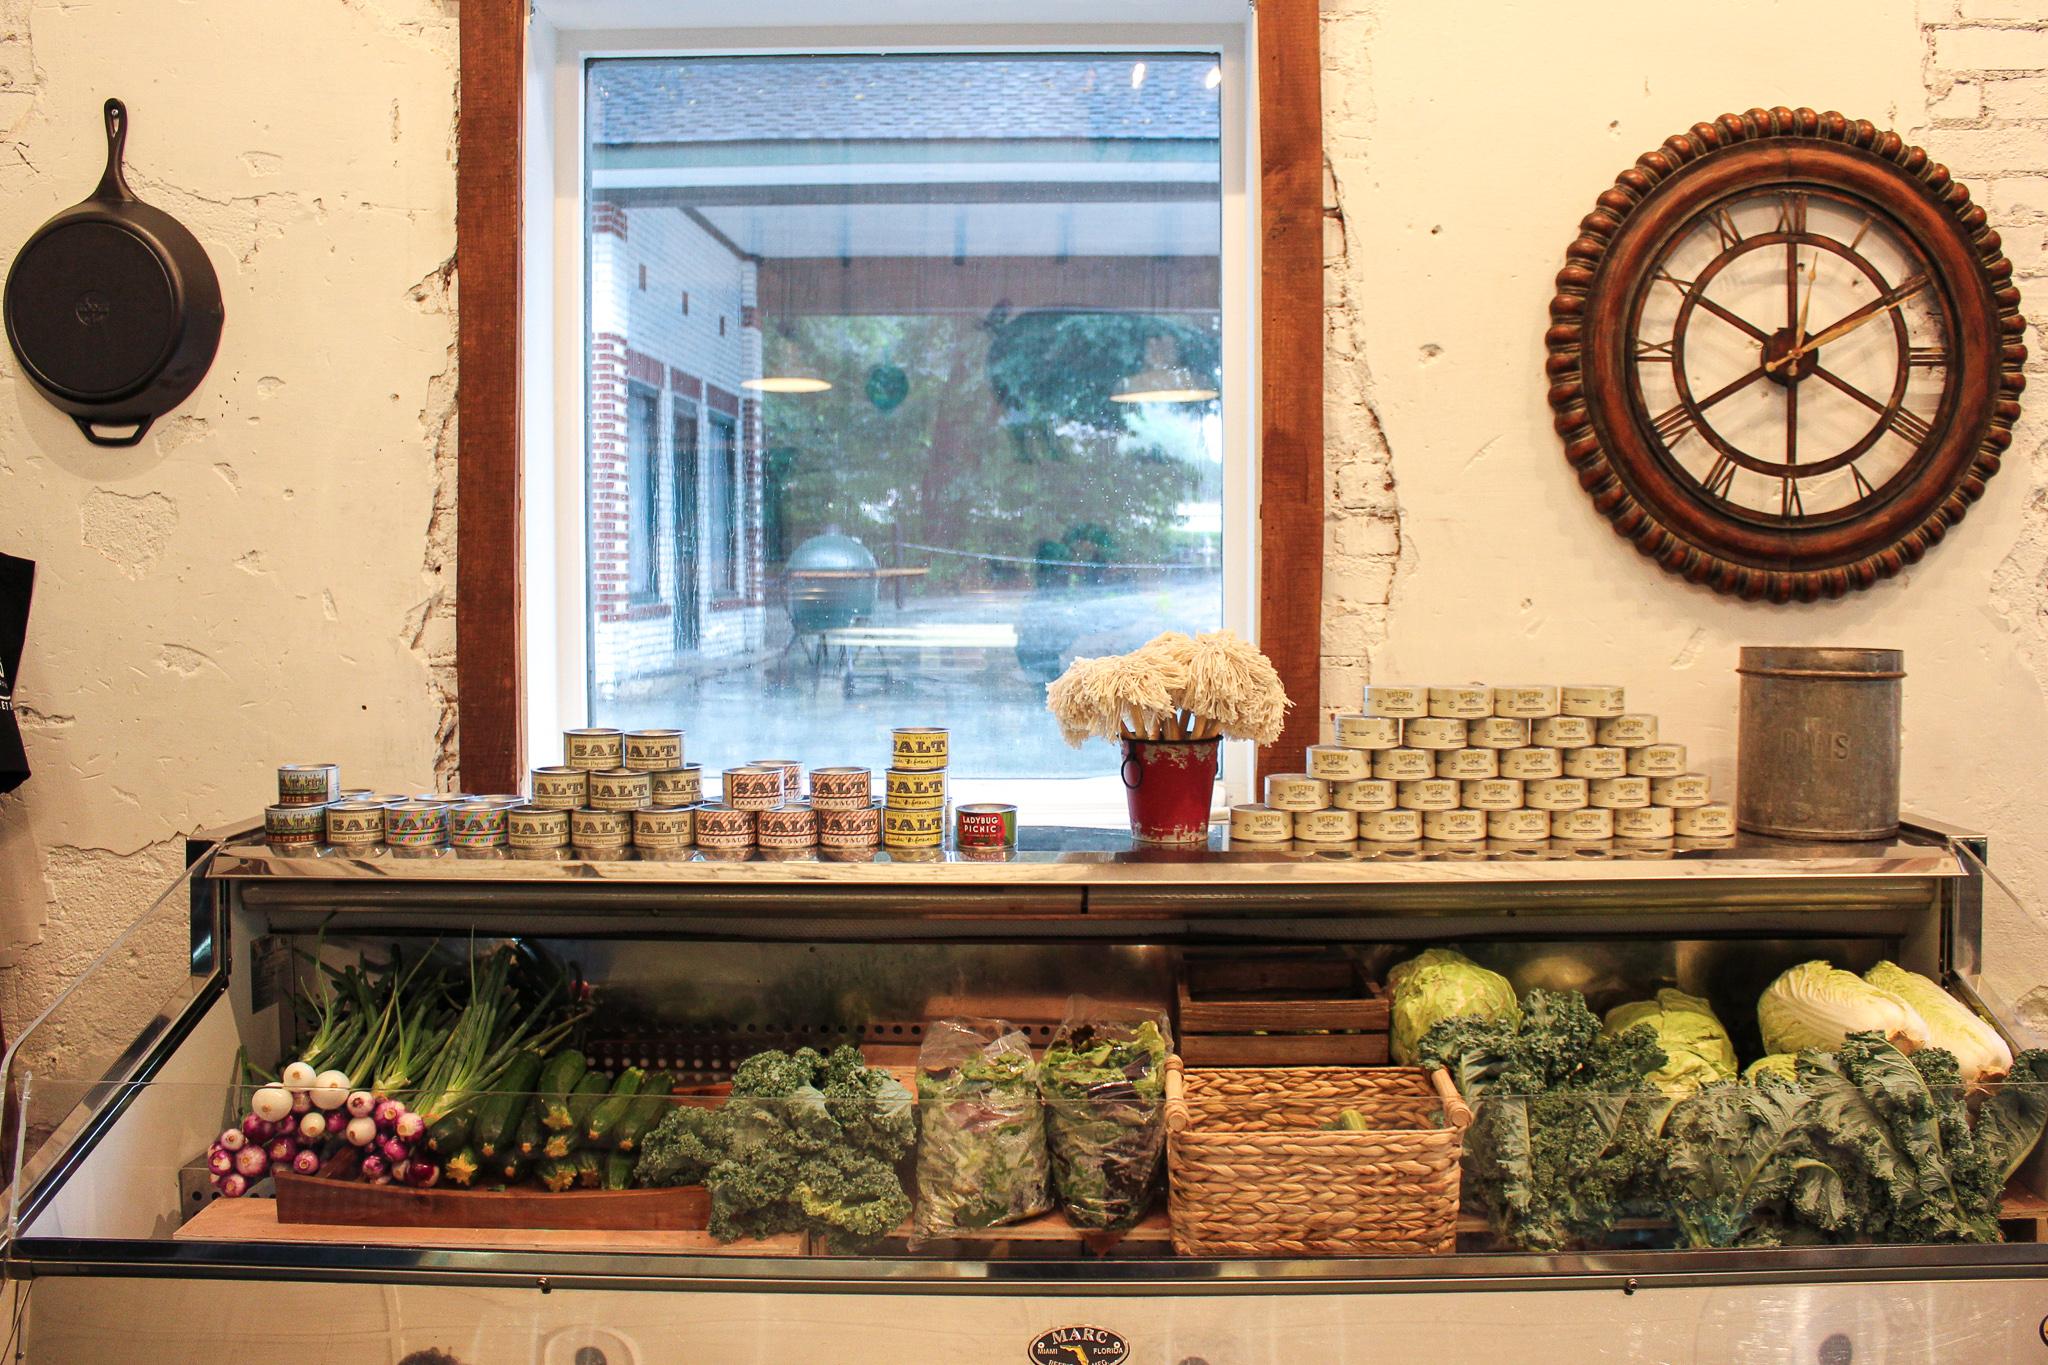 Local produce at Chop Shop (c) Anna Lanfreschi